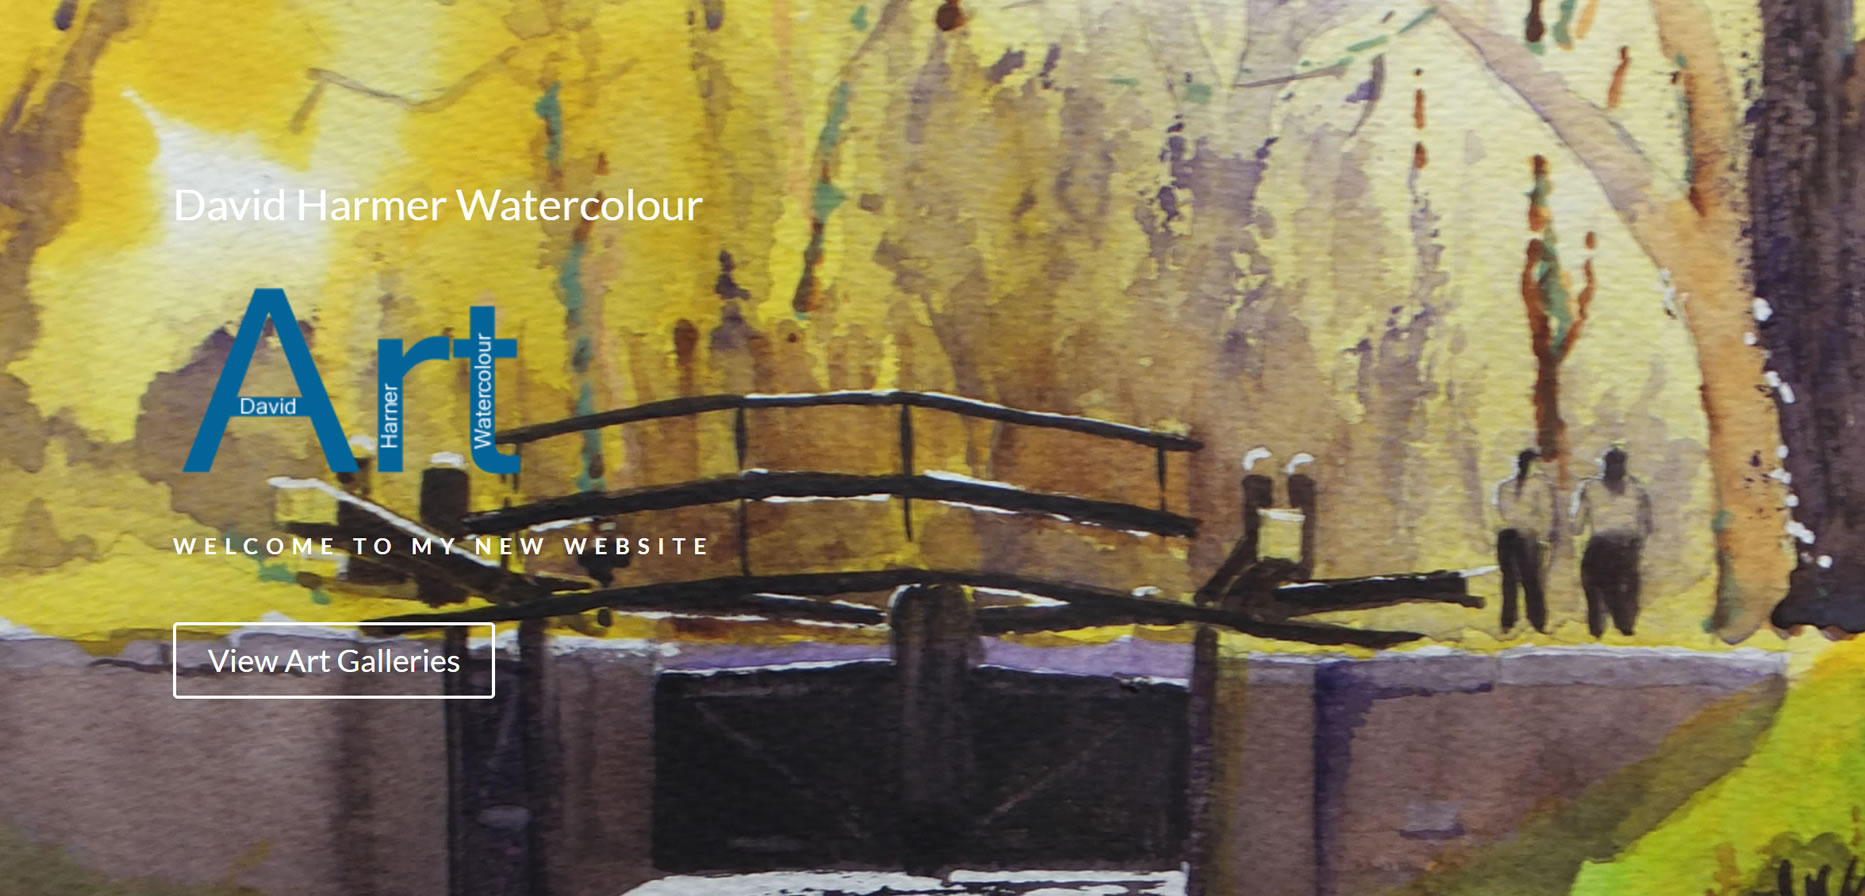 Art Website Builder - Sussex & Surrey Artists site for David Harmer Watercolour